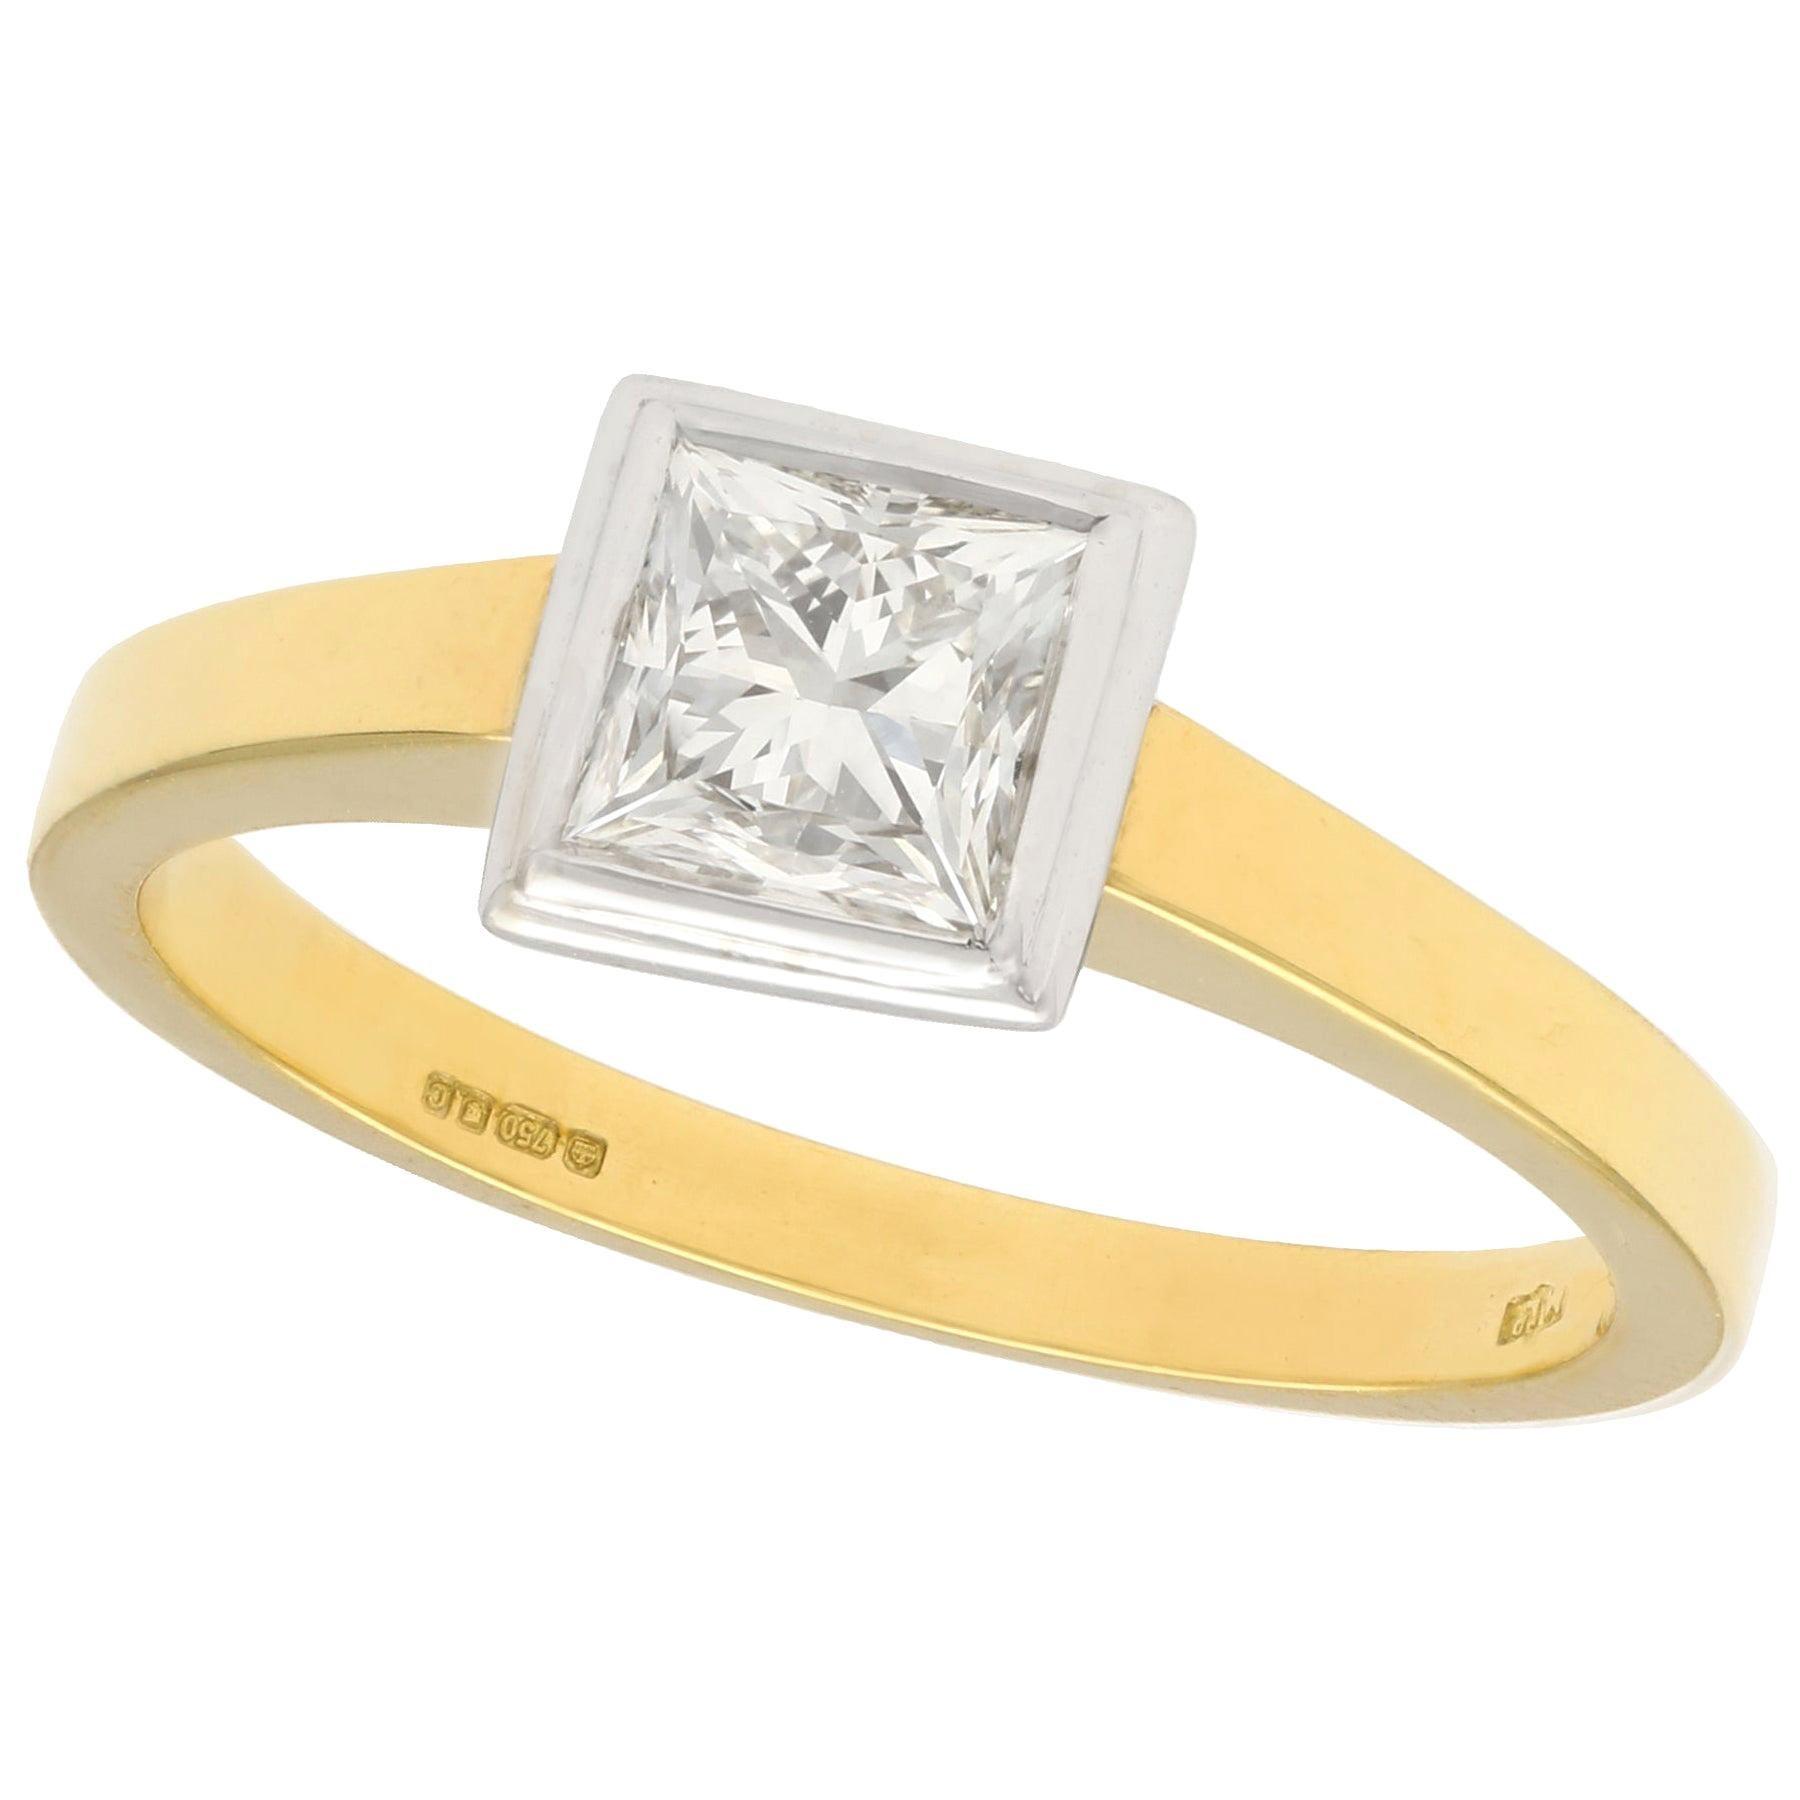 Princess Cut 1.10 Carat Diamond Yellow Gold Solitaire Engagement Ring